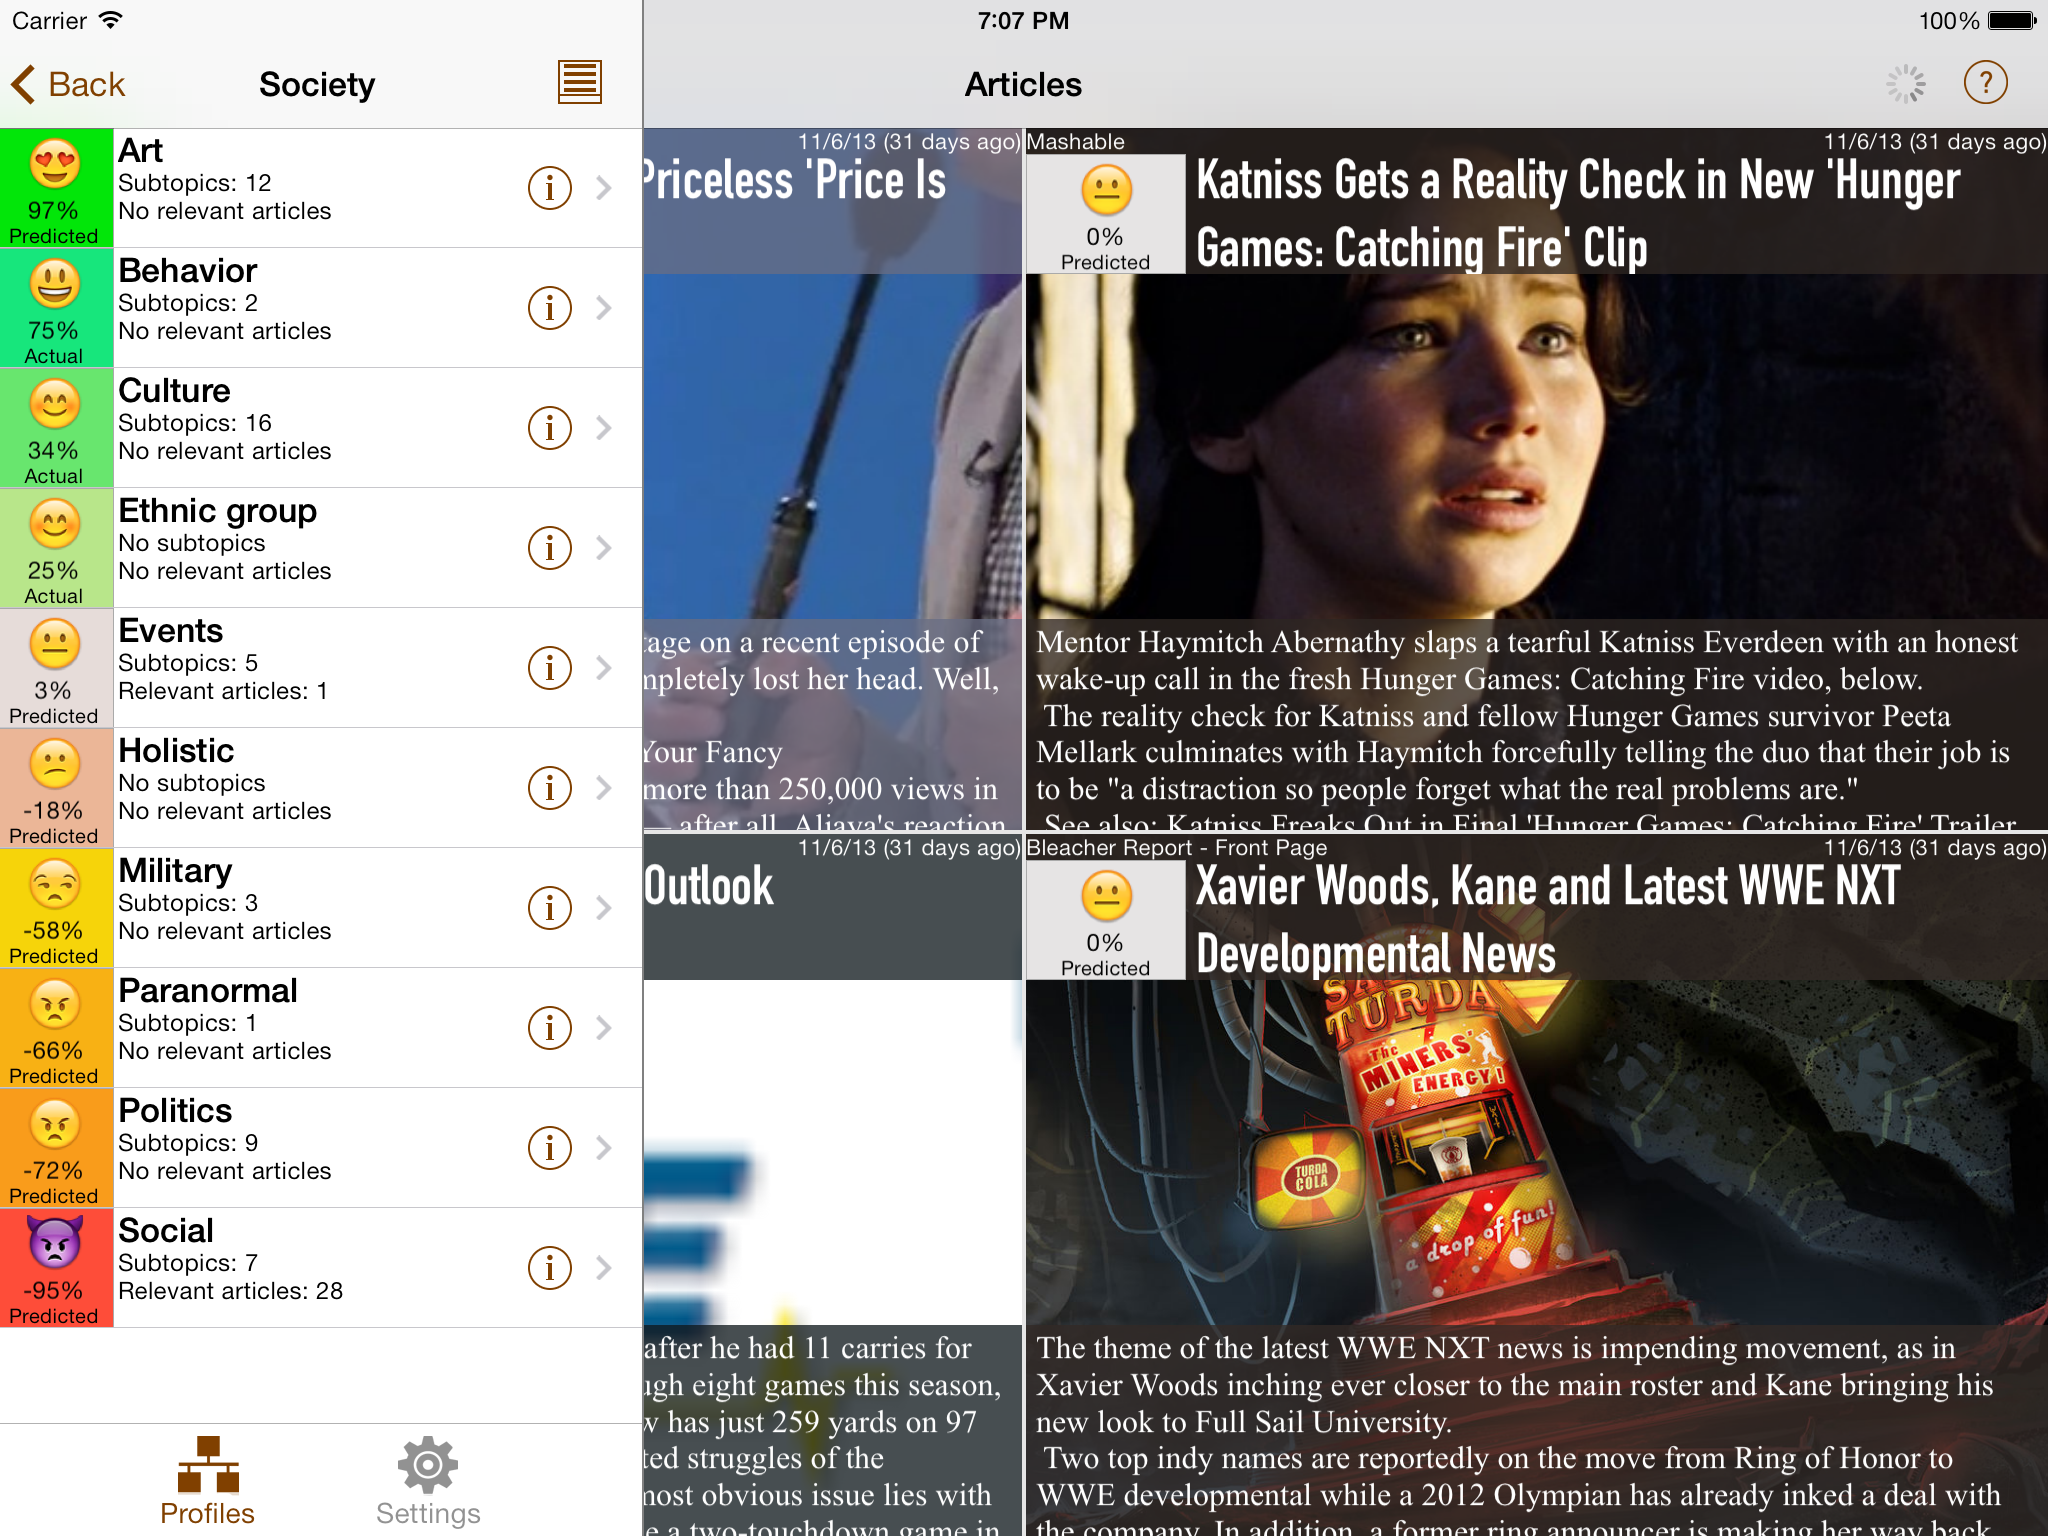 NewsBrain iPad Landscape with Articles and Topics